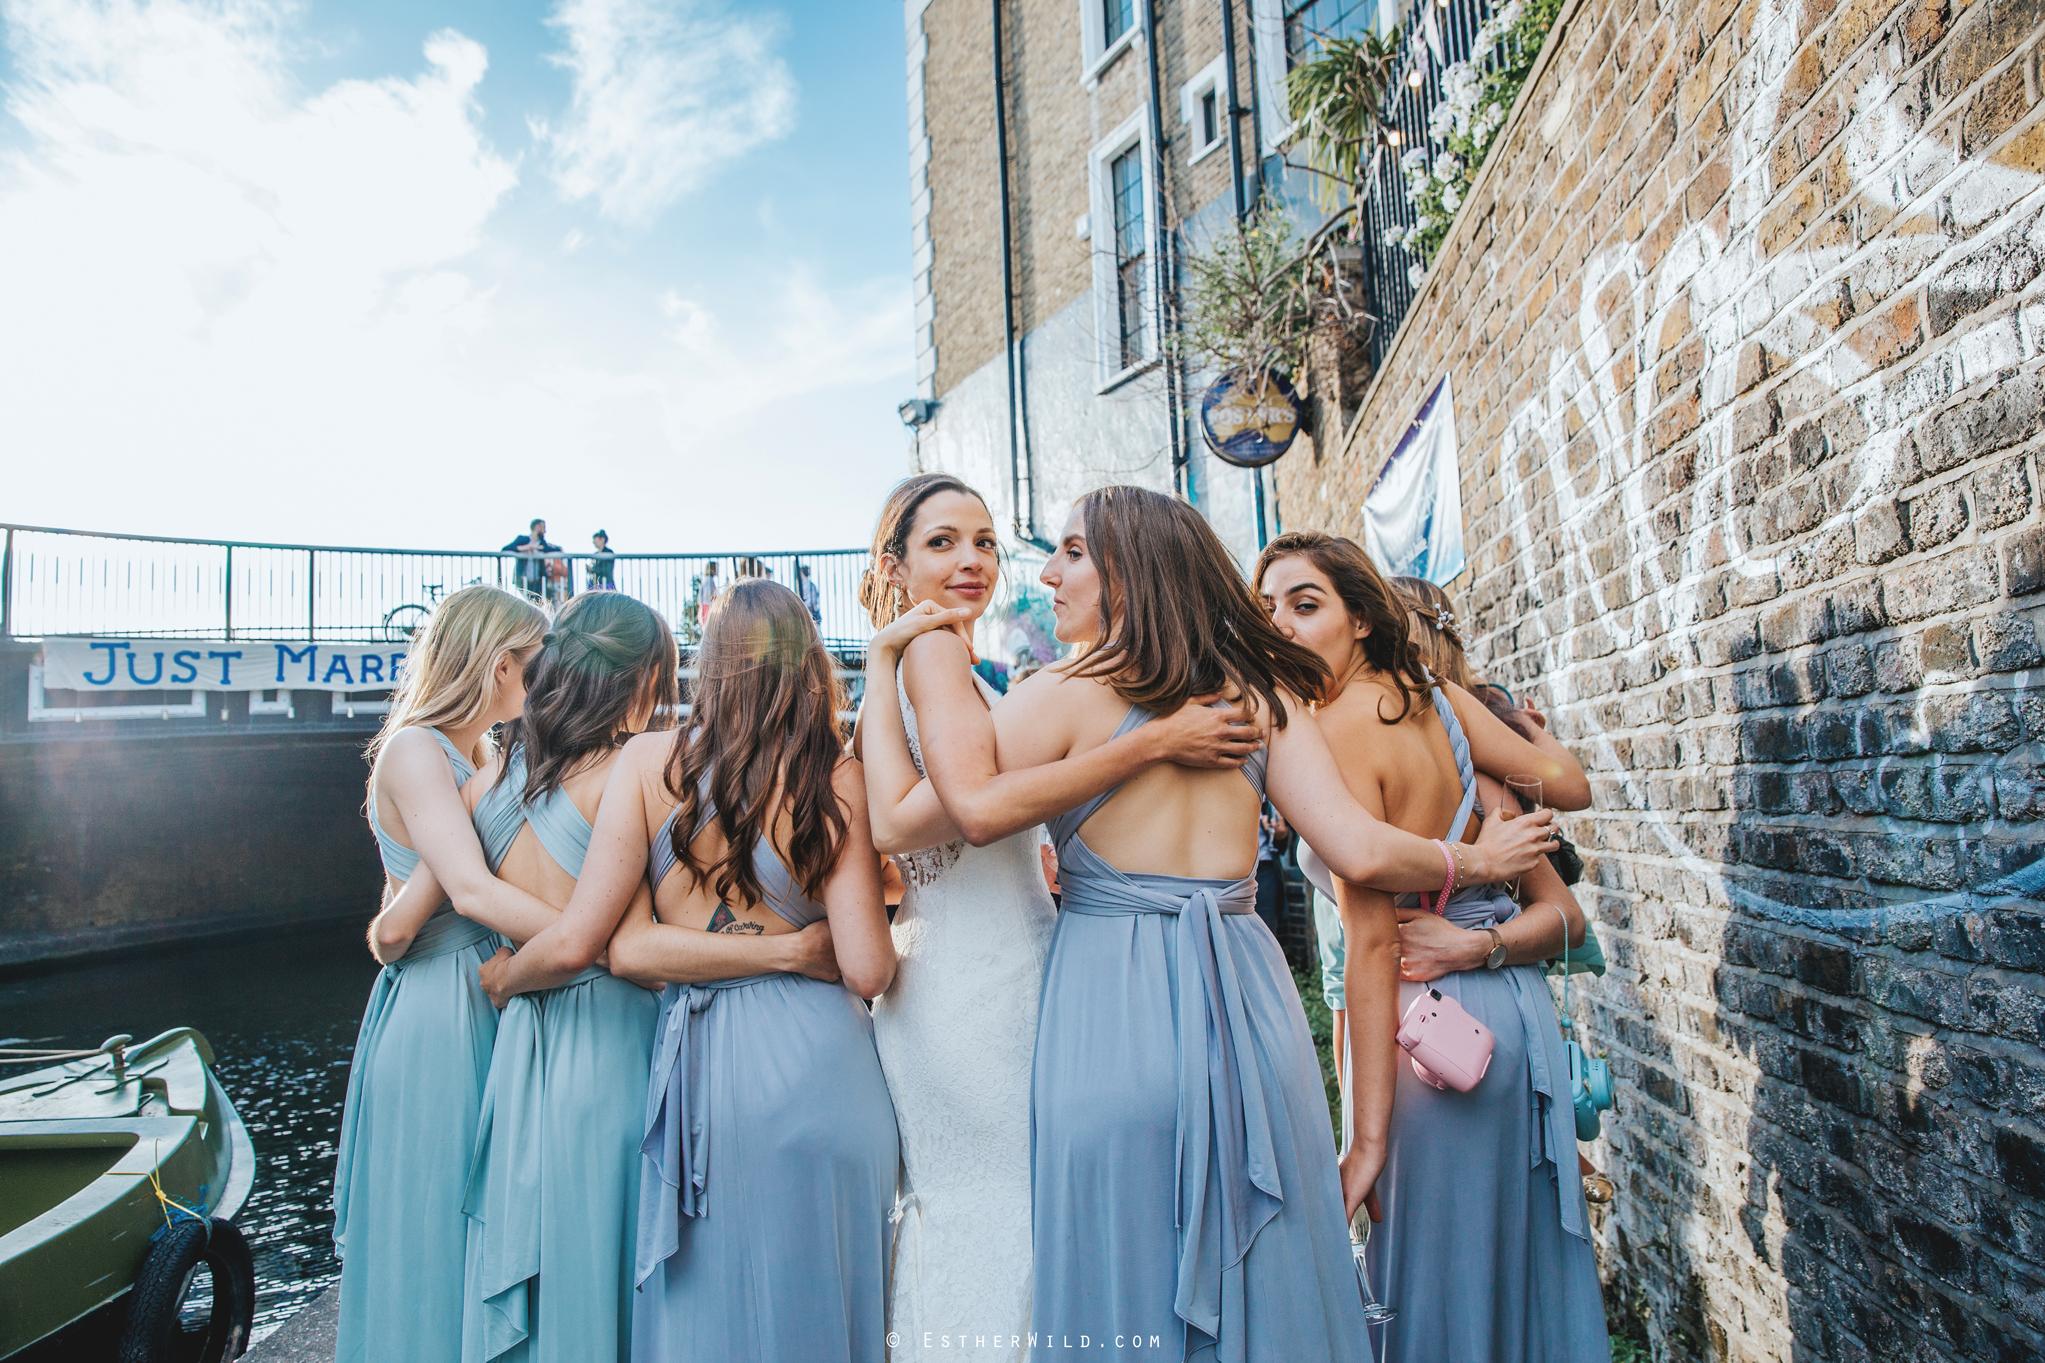 Islington_Town_Hall_Wedding_London_Photographer_Esther_Wild_IMG_7284.jpg